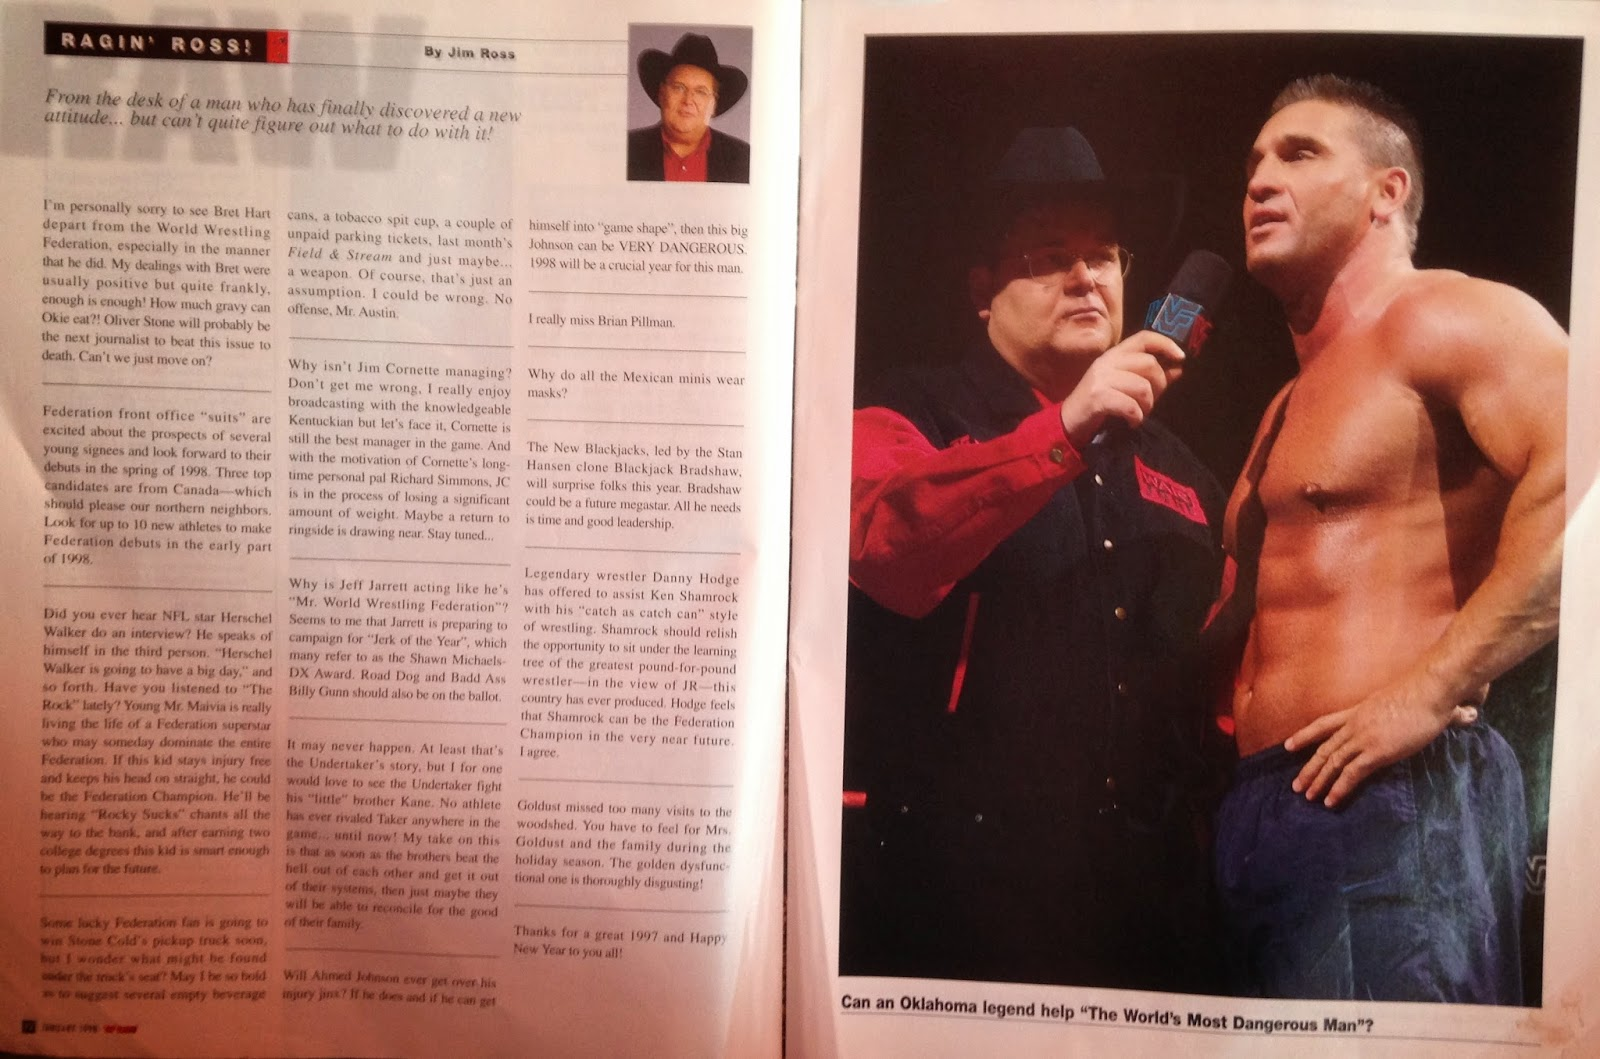 WWE: WWF RAW MAGAZINE - January 1998 - Jim Ross's report